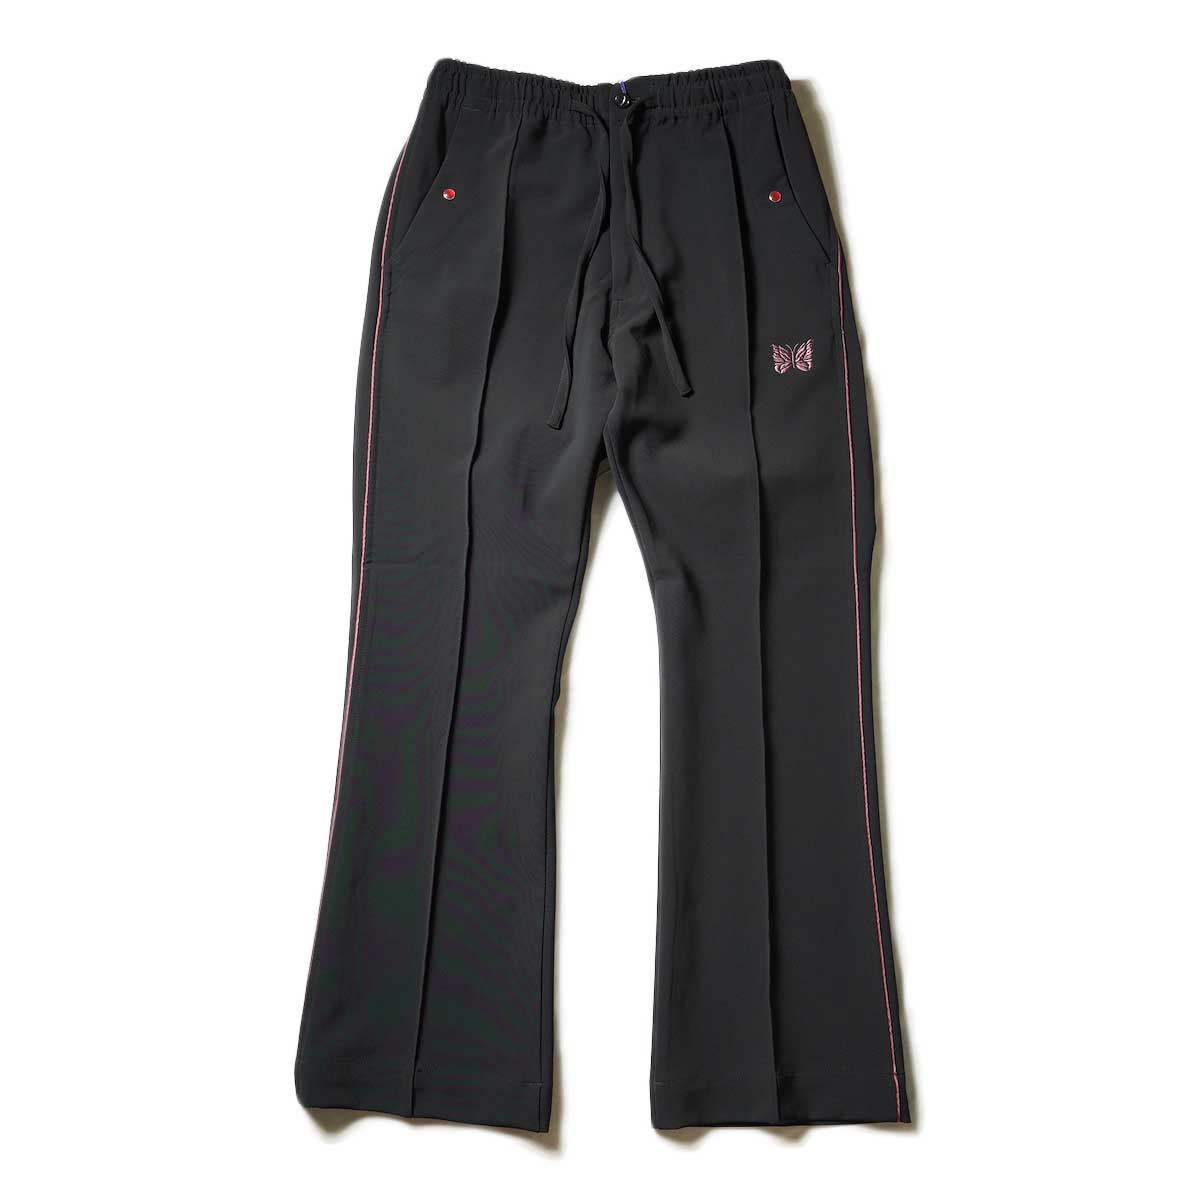 (Ladie's) Needles / Piping Cowboy Pants - Pe/Pu Double Cloth (Black)Needles / Piping Cowboy Pants - Pe/Pu Double Cloth (Black)